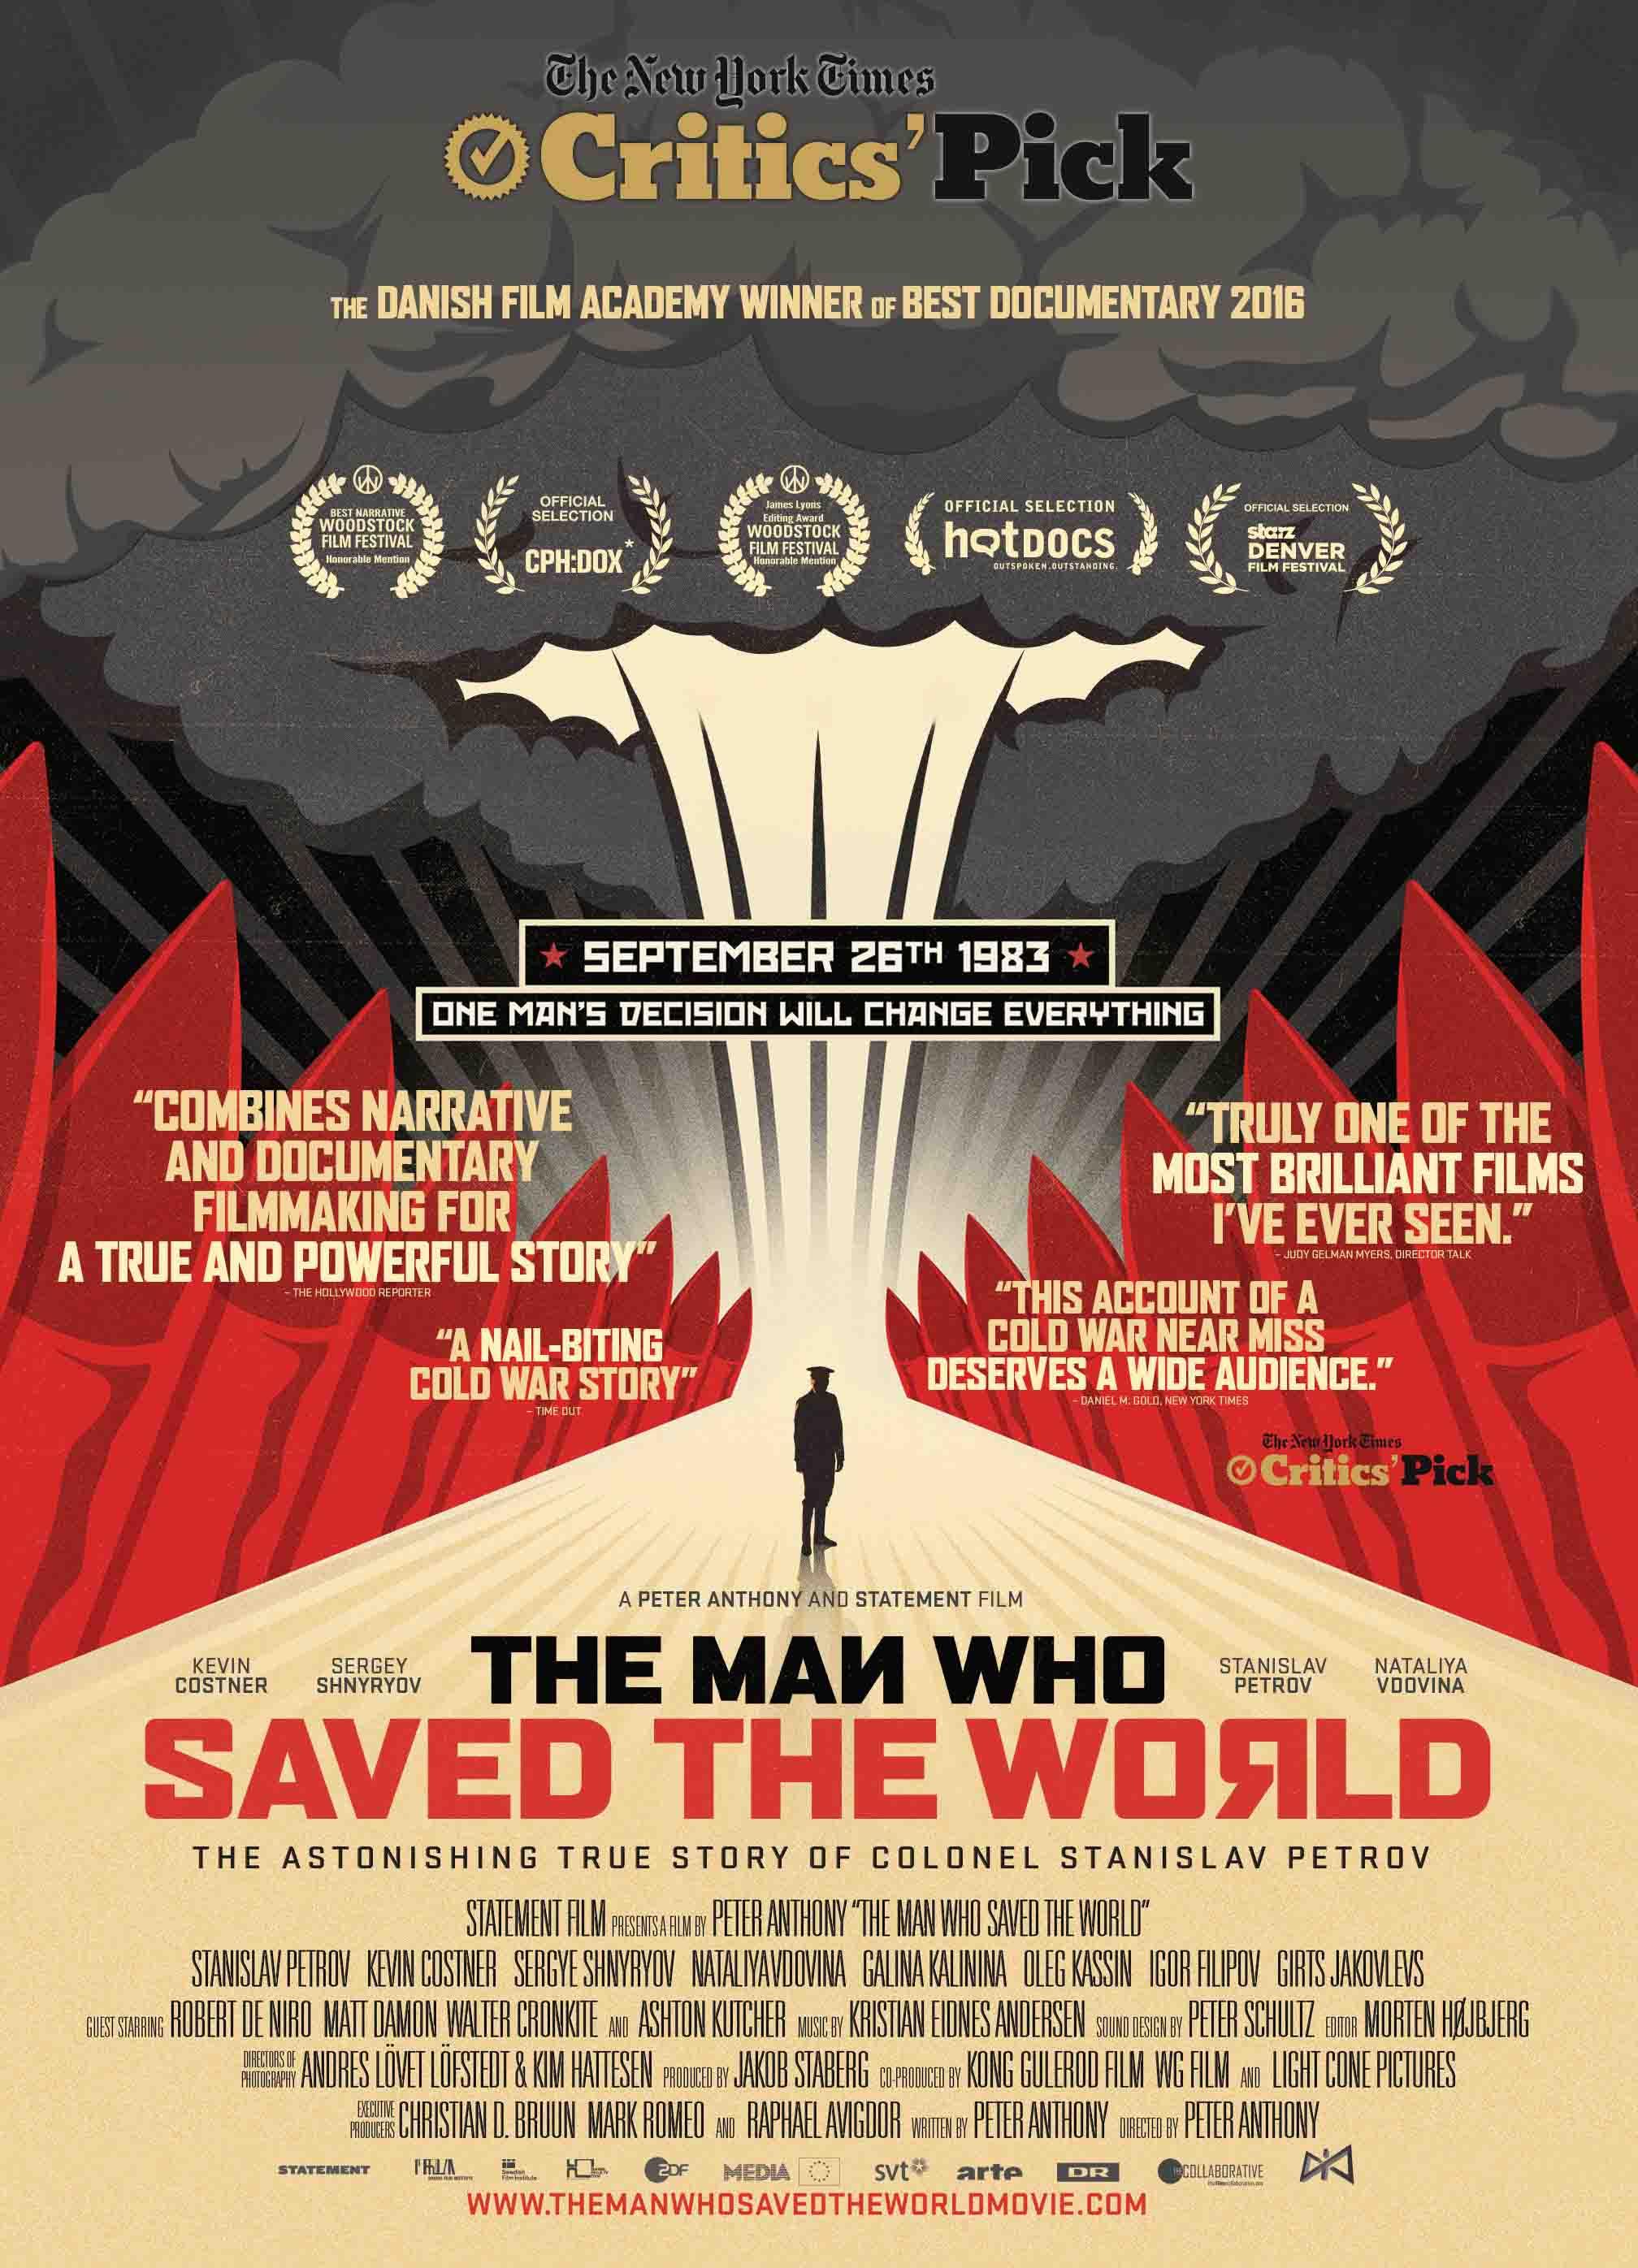 M2014019CIM 拯救世界的人 the-man-who-saved-the-world (2014)_c29215b2.jpg